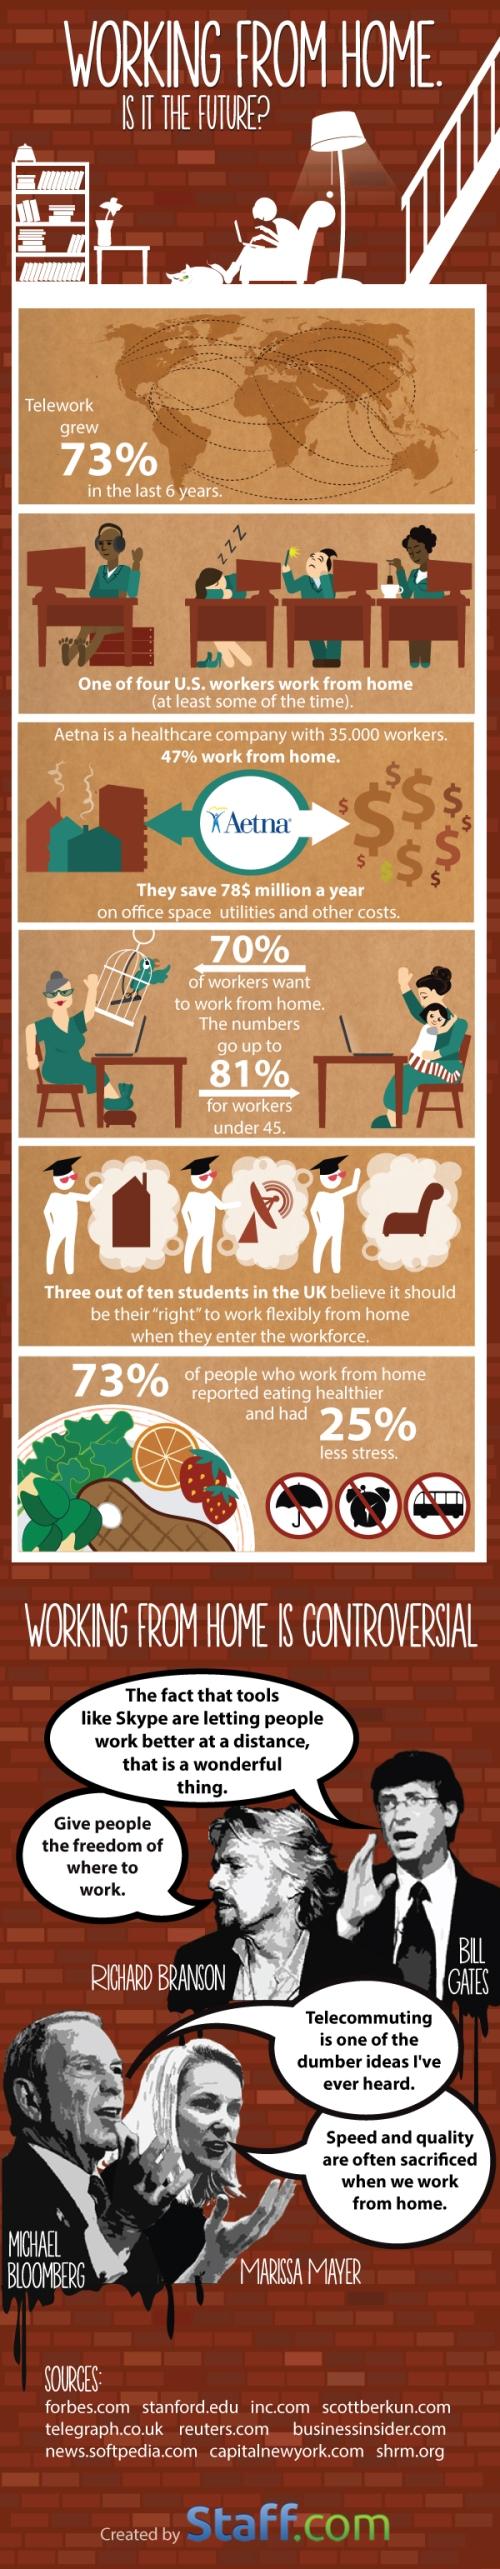 workfromhomefuture_infographic.jpg